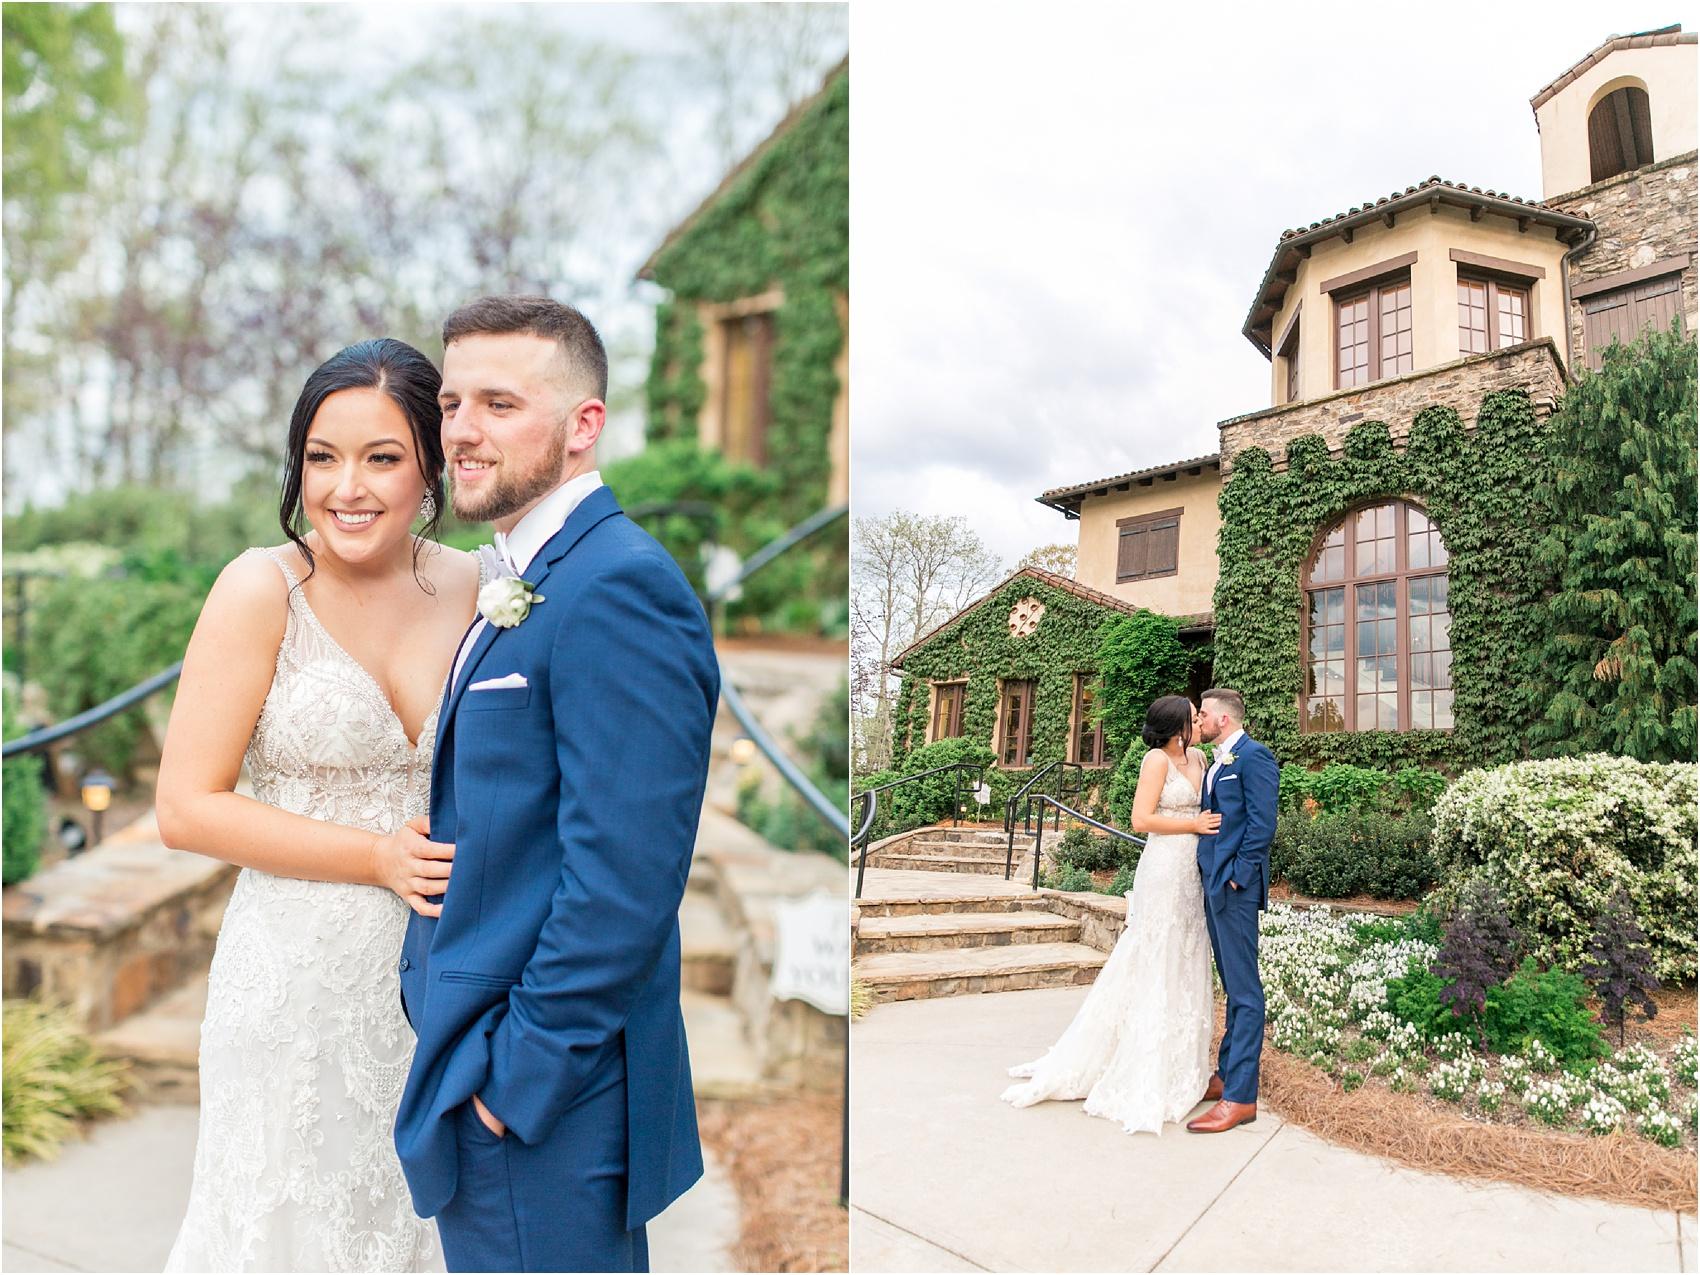 Savannah Eve Photography- Turnbill-Gilgan Wedding- Blog-82.jpg